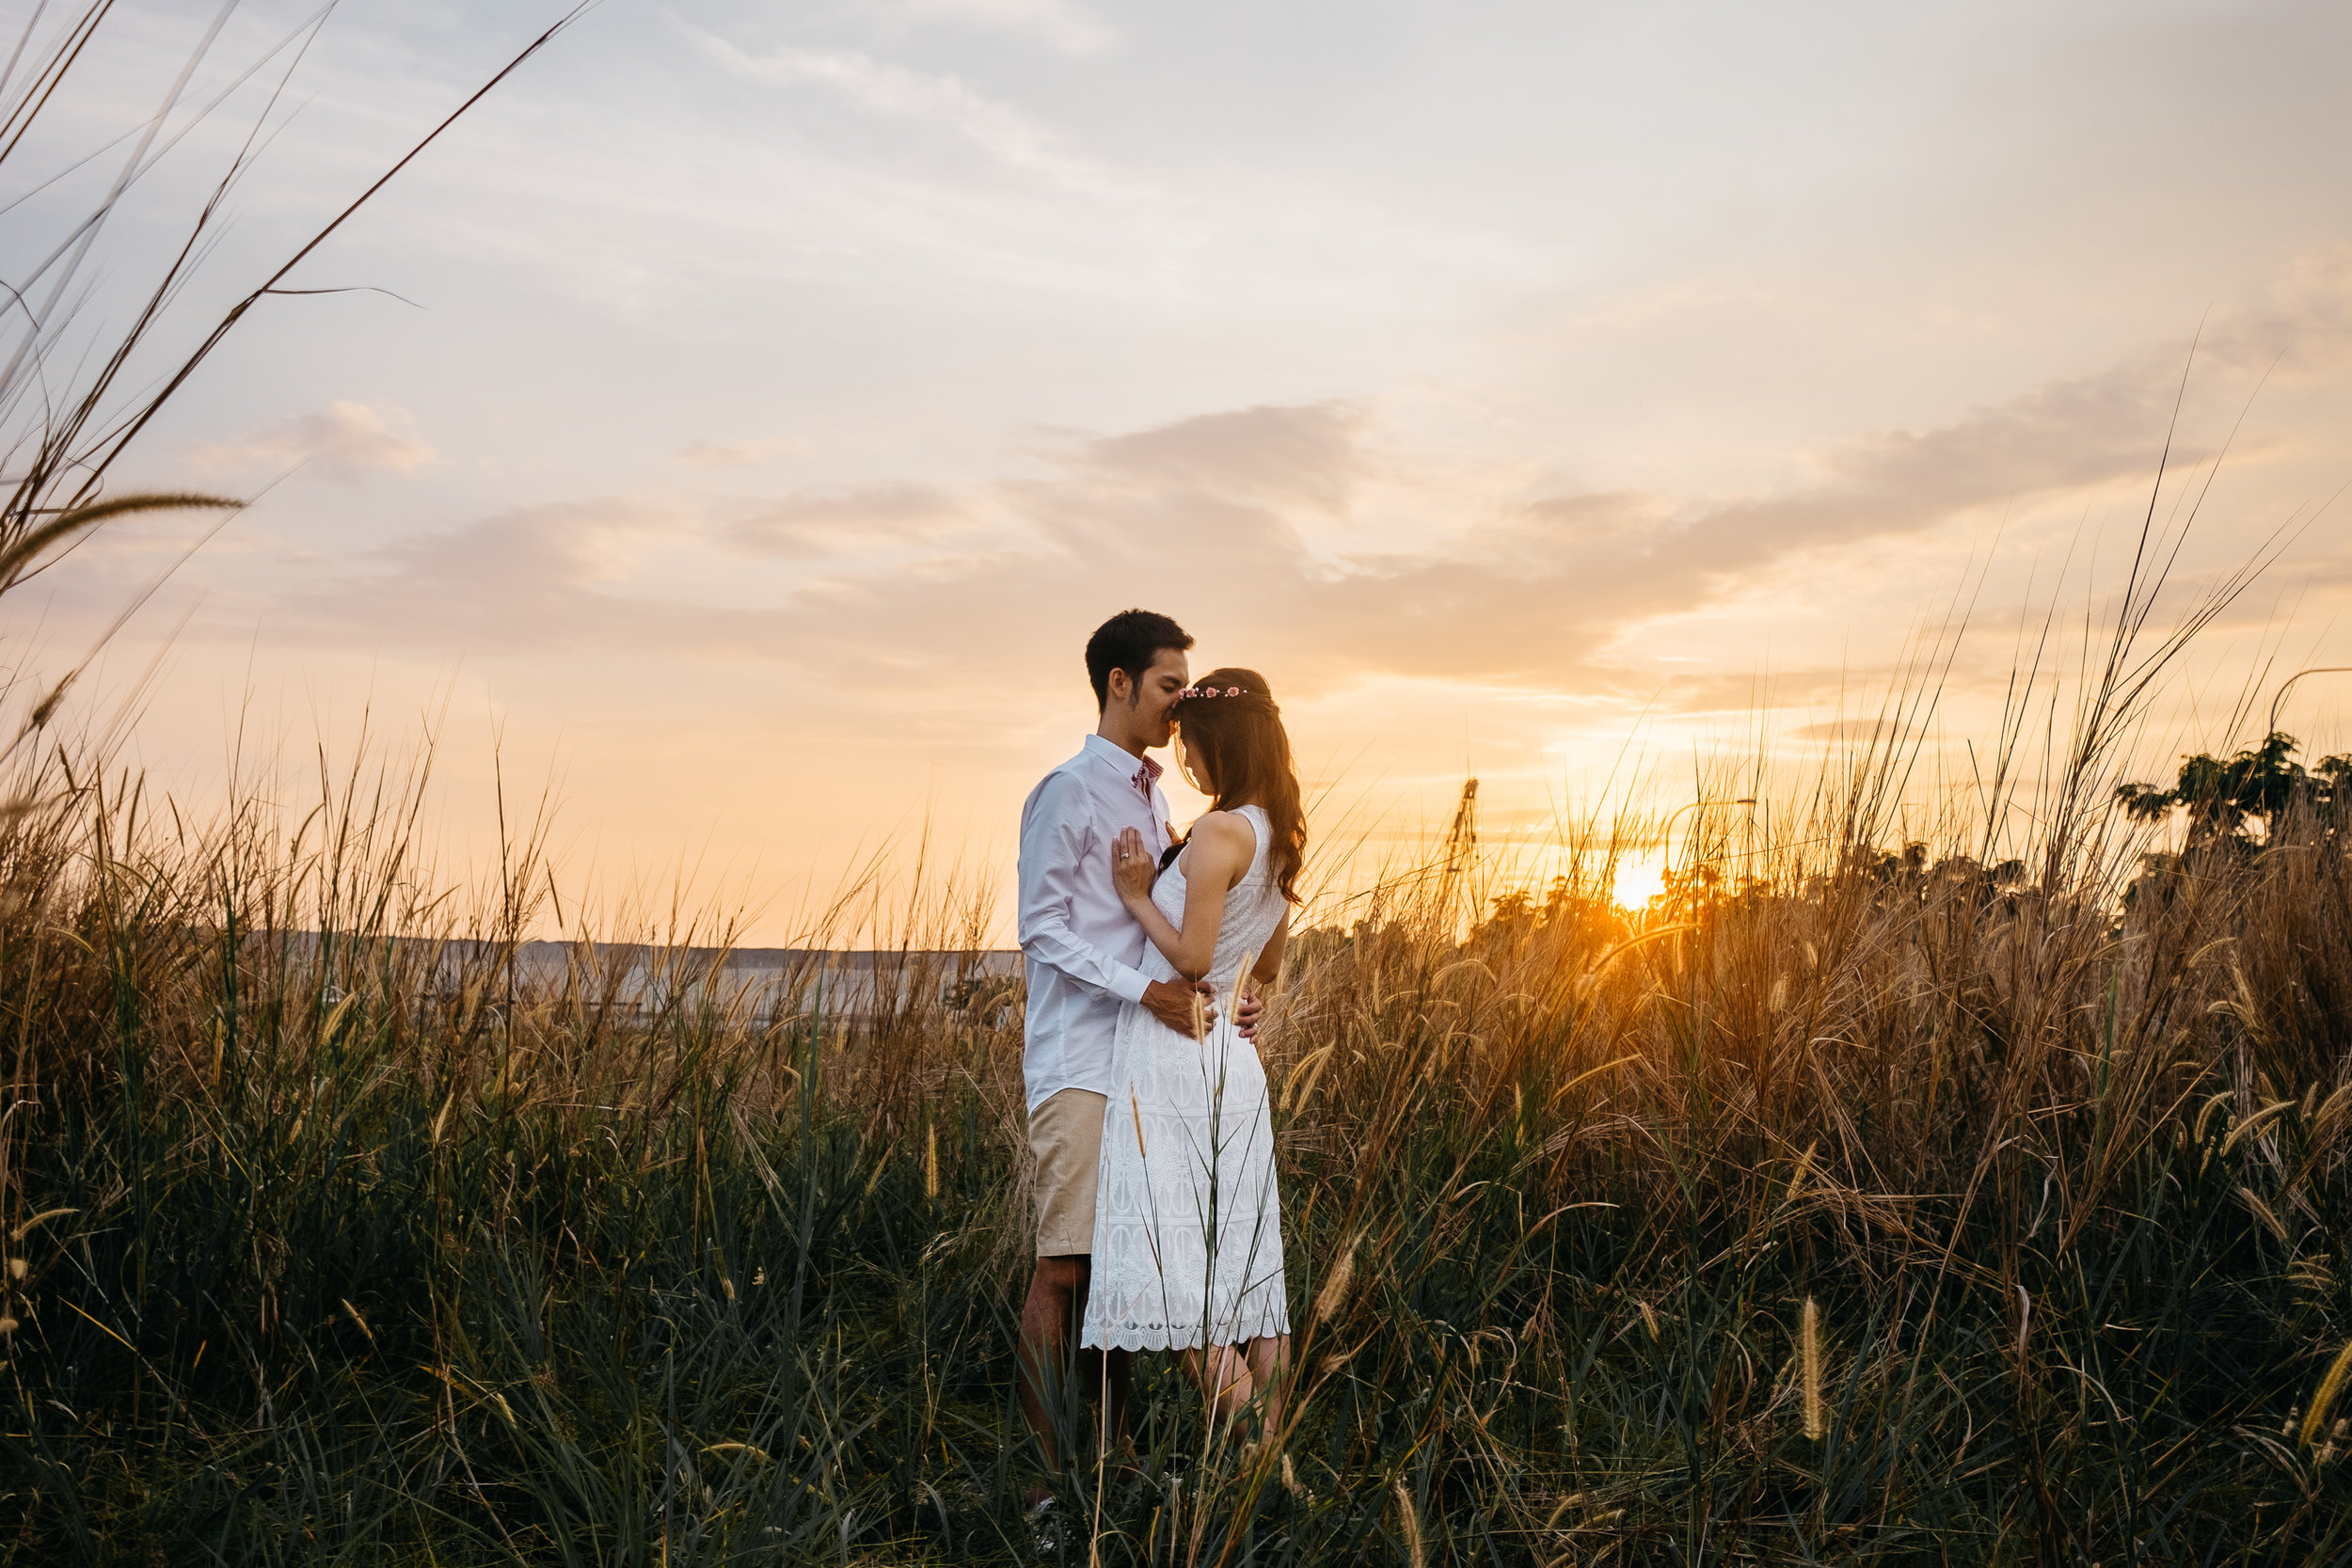 Juxtapose Pix - Pre-Wedding - Mark & Therese - Tuas Sunset 00012.jpg